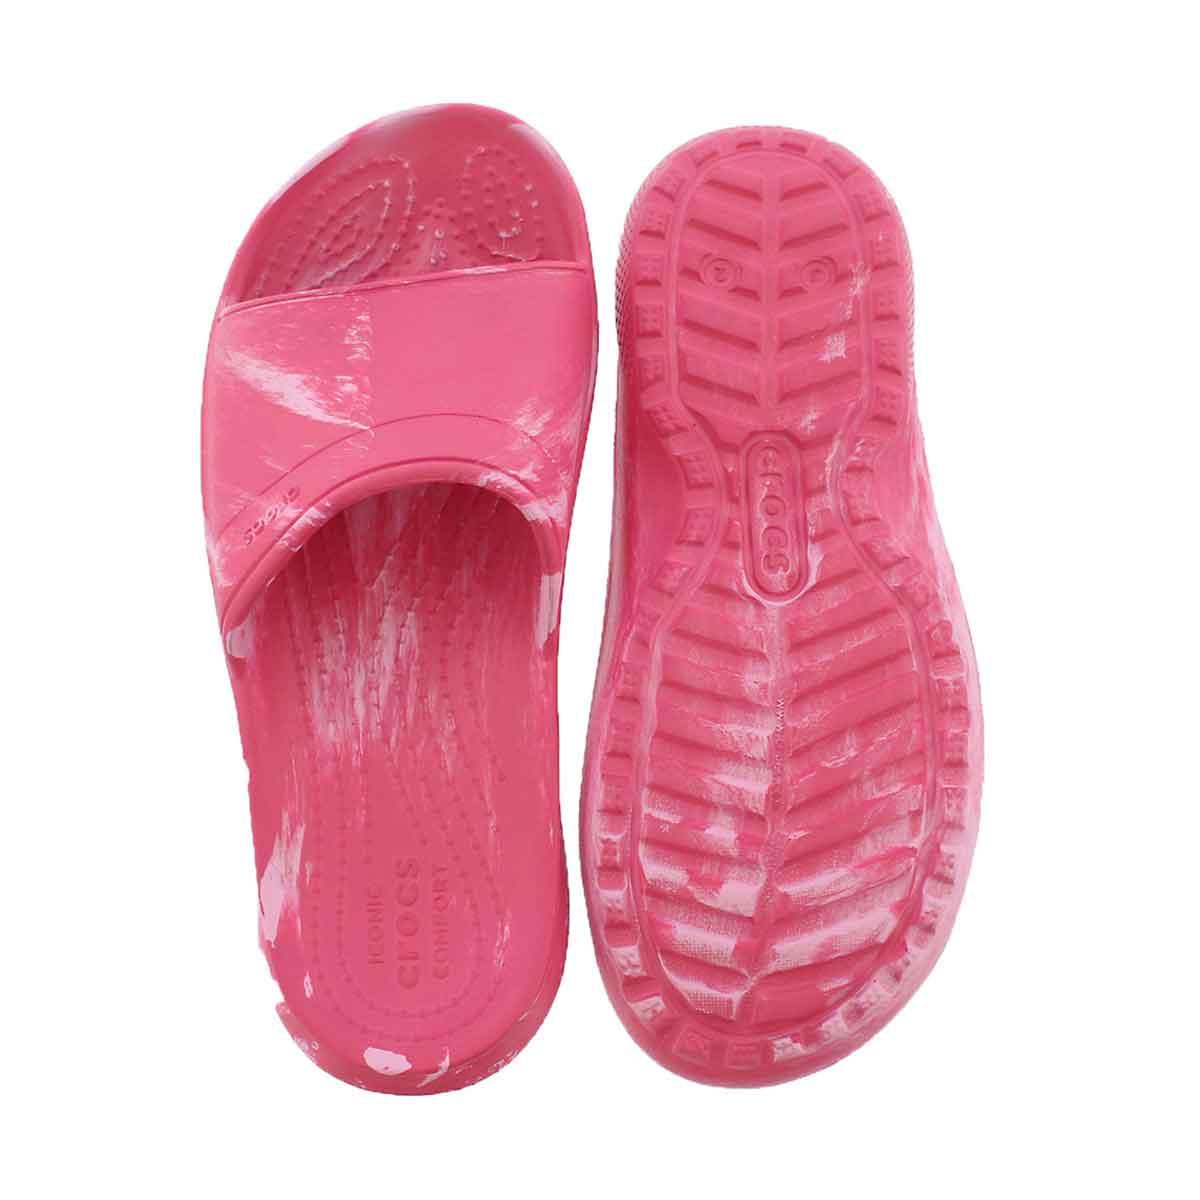 Grls Classic Swirl pink slide sndl